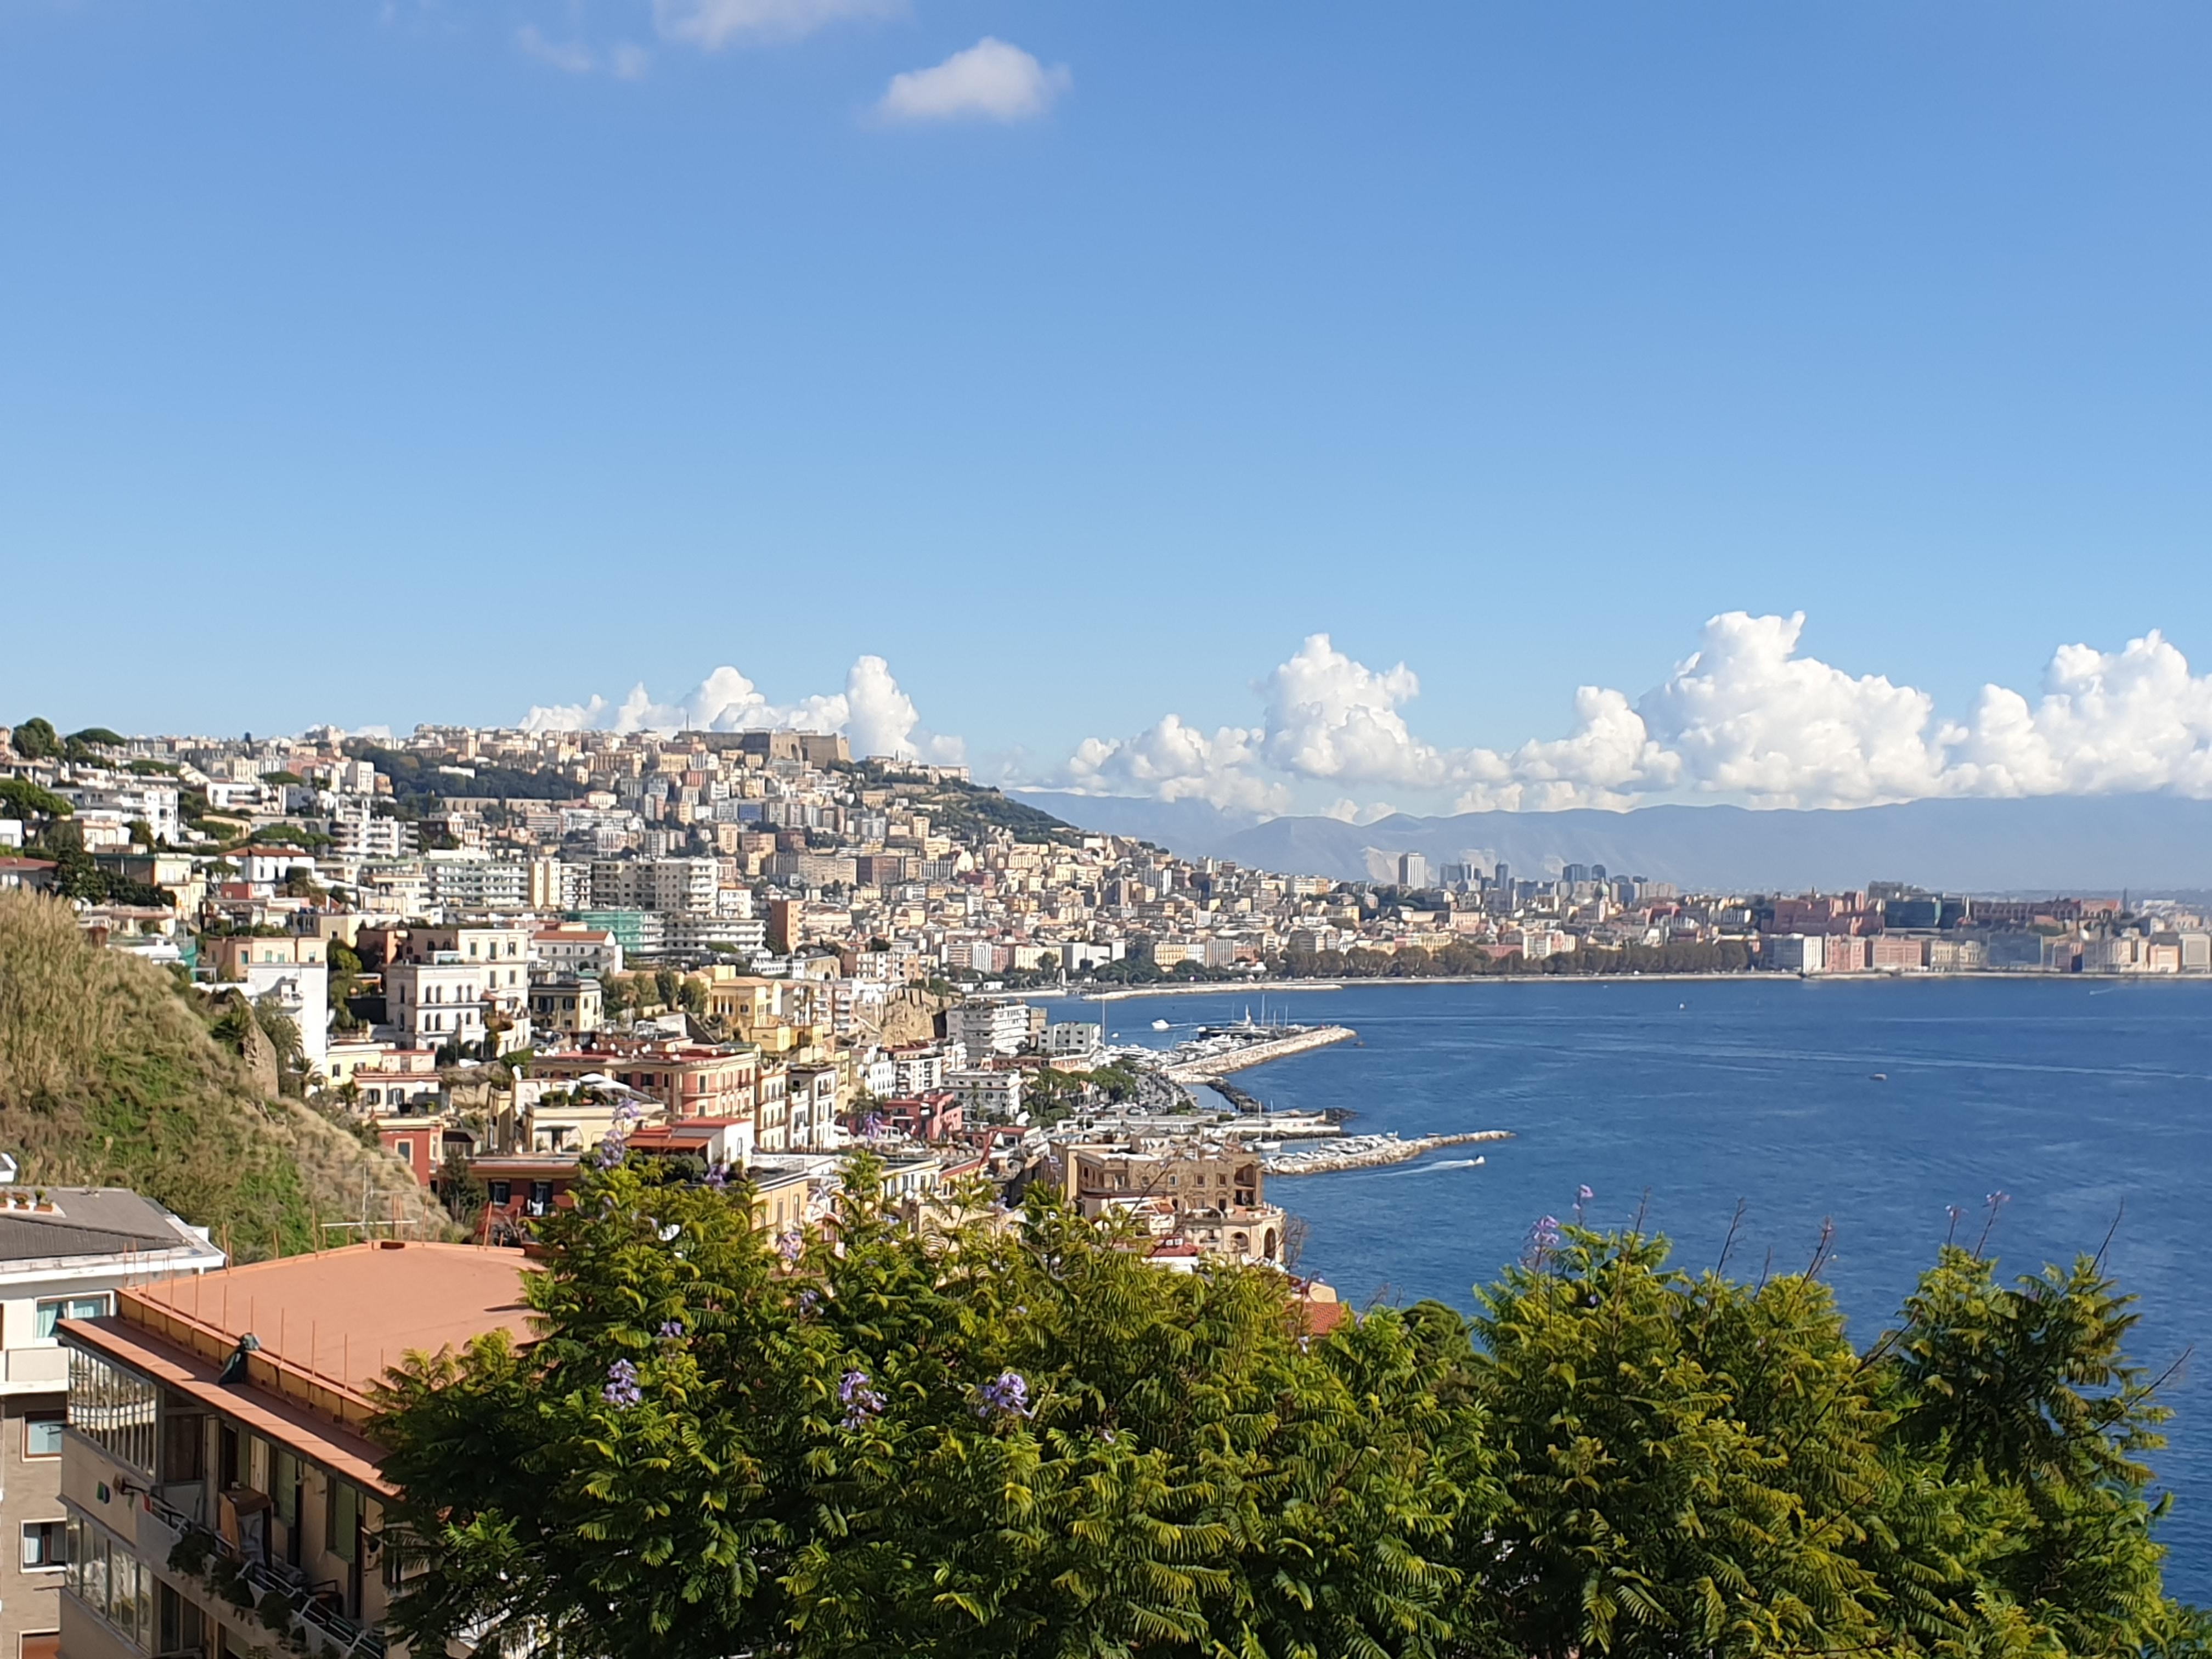 Napoli vista da Posillipo